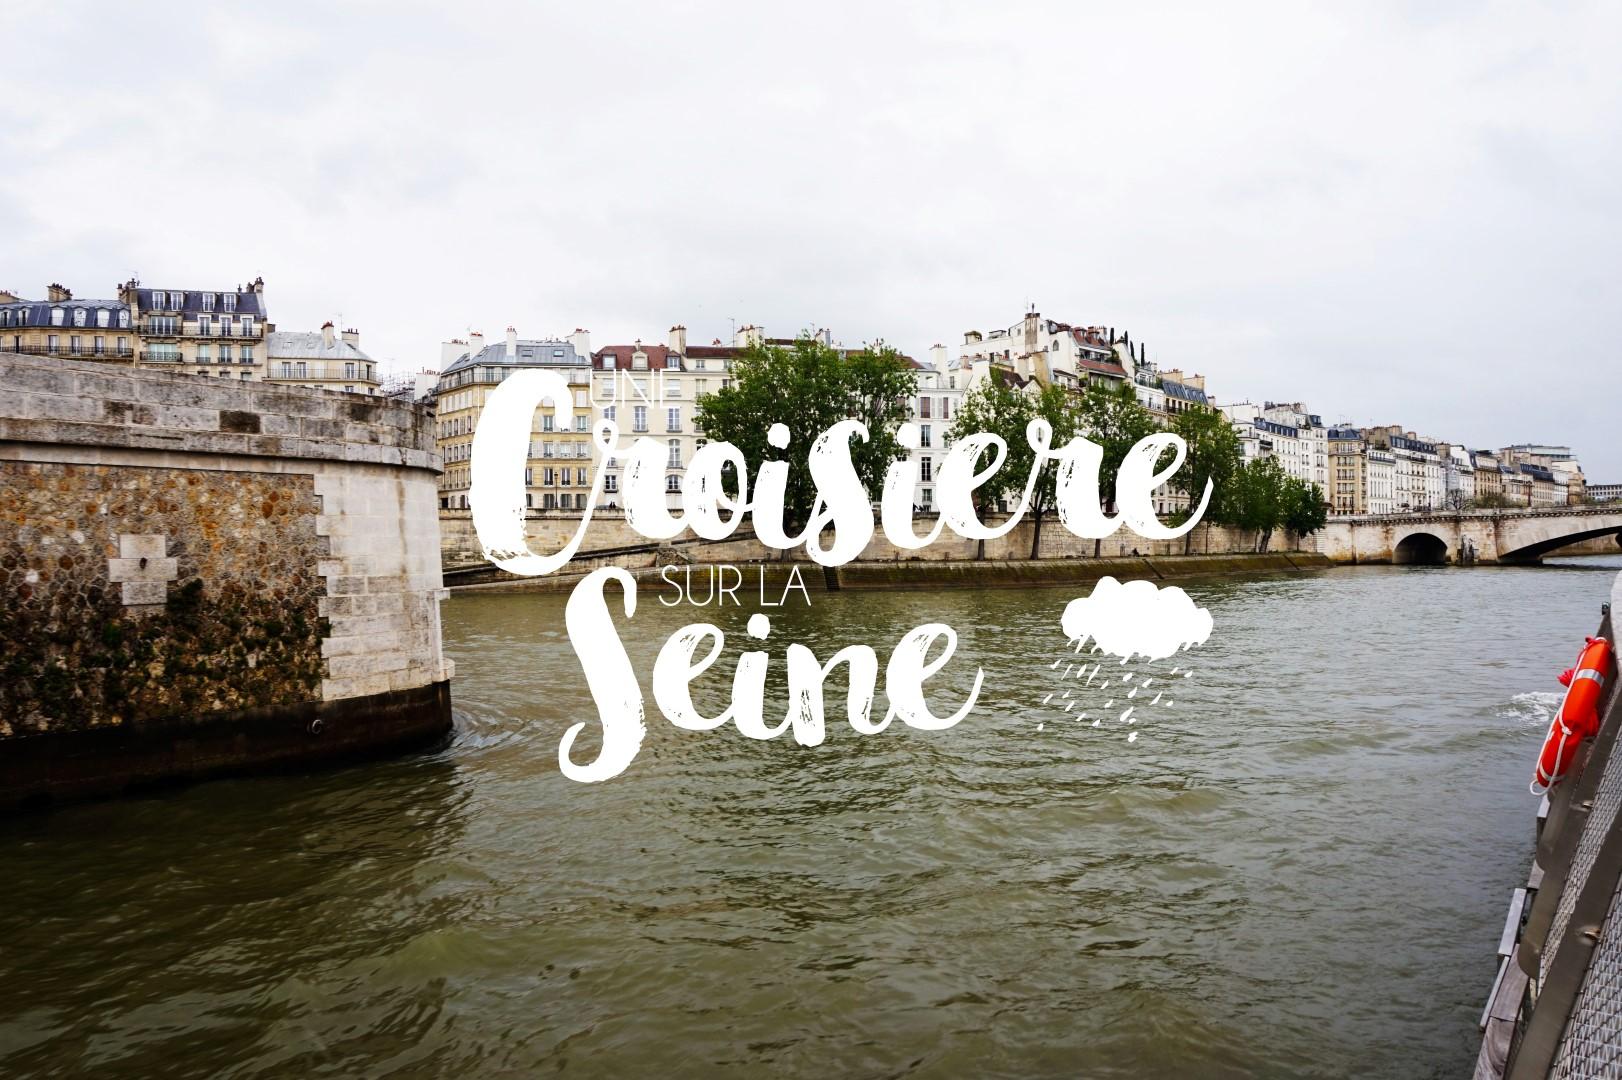 20160619_croisiere_seine_nuage (Large)